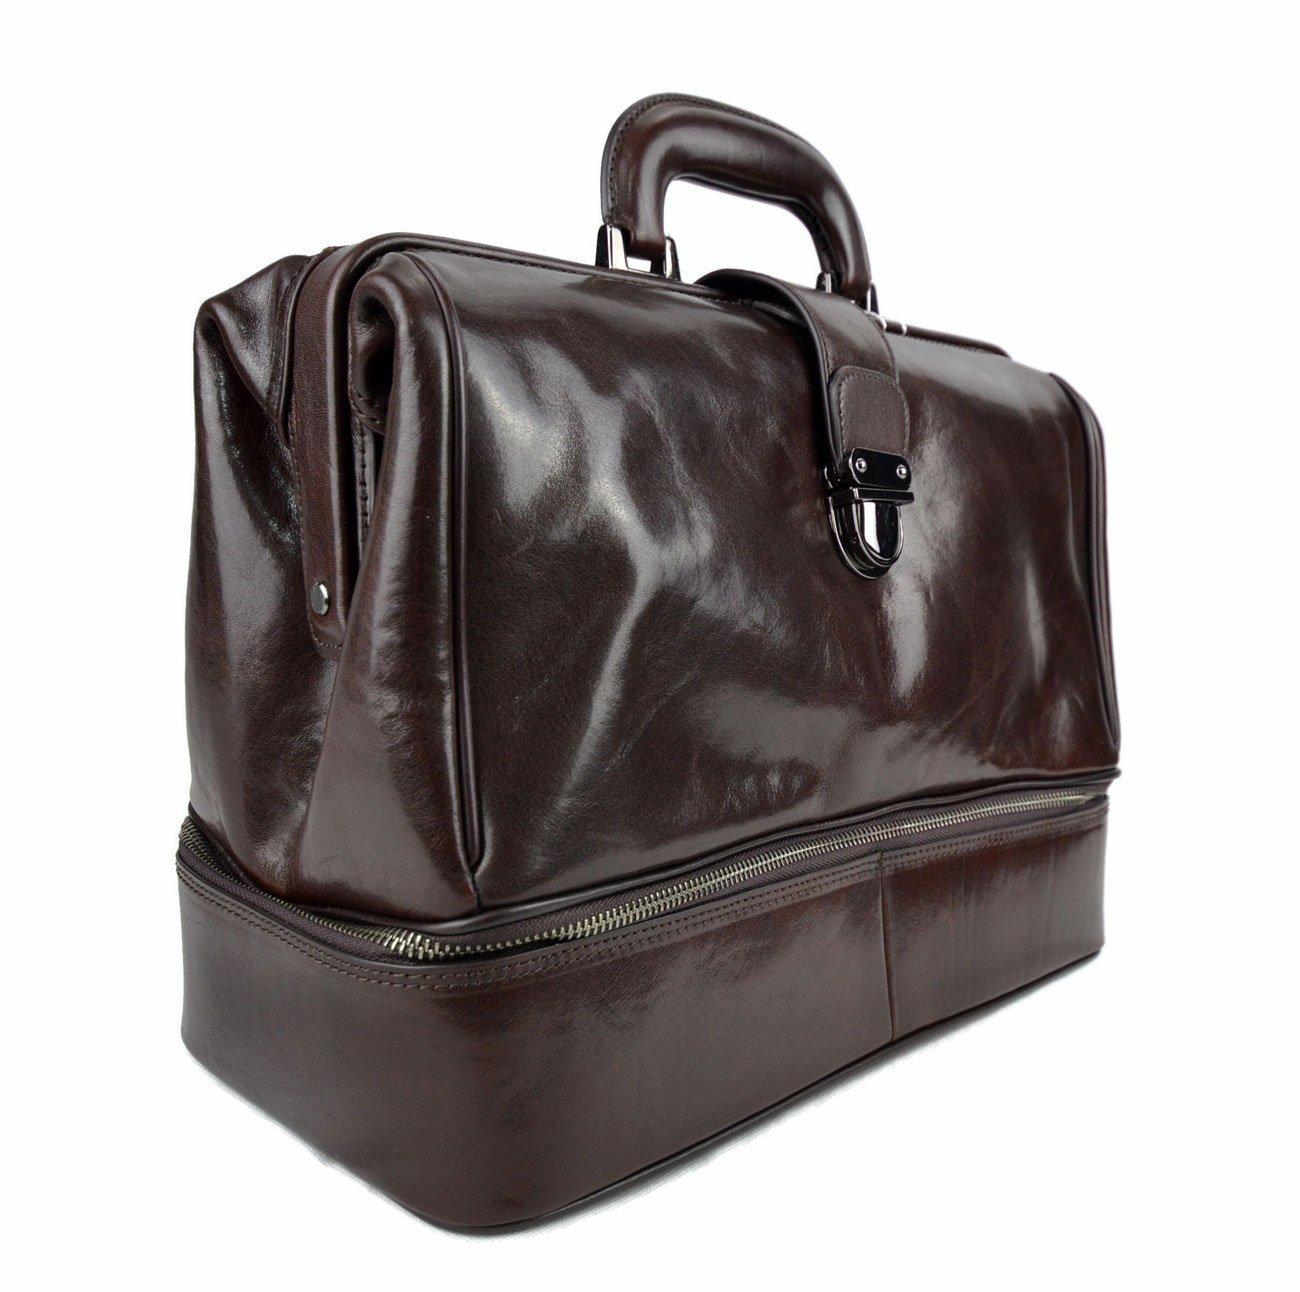 Doctor bag dark brown leather retro bag doctor bag for men women medical bag retro bag - handmade-bags